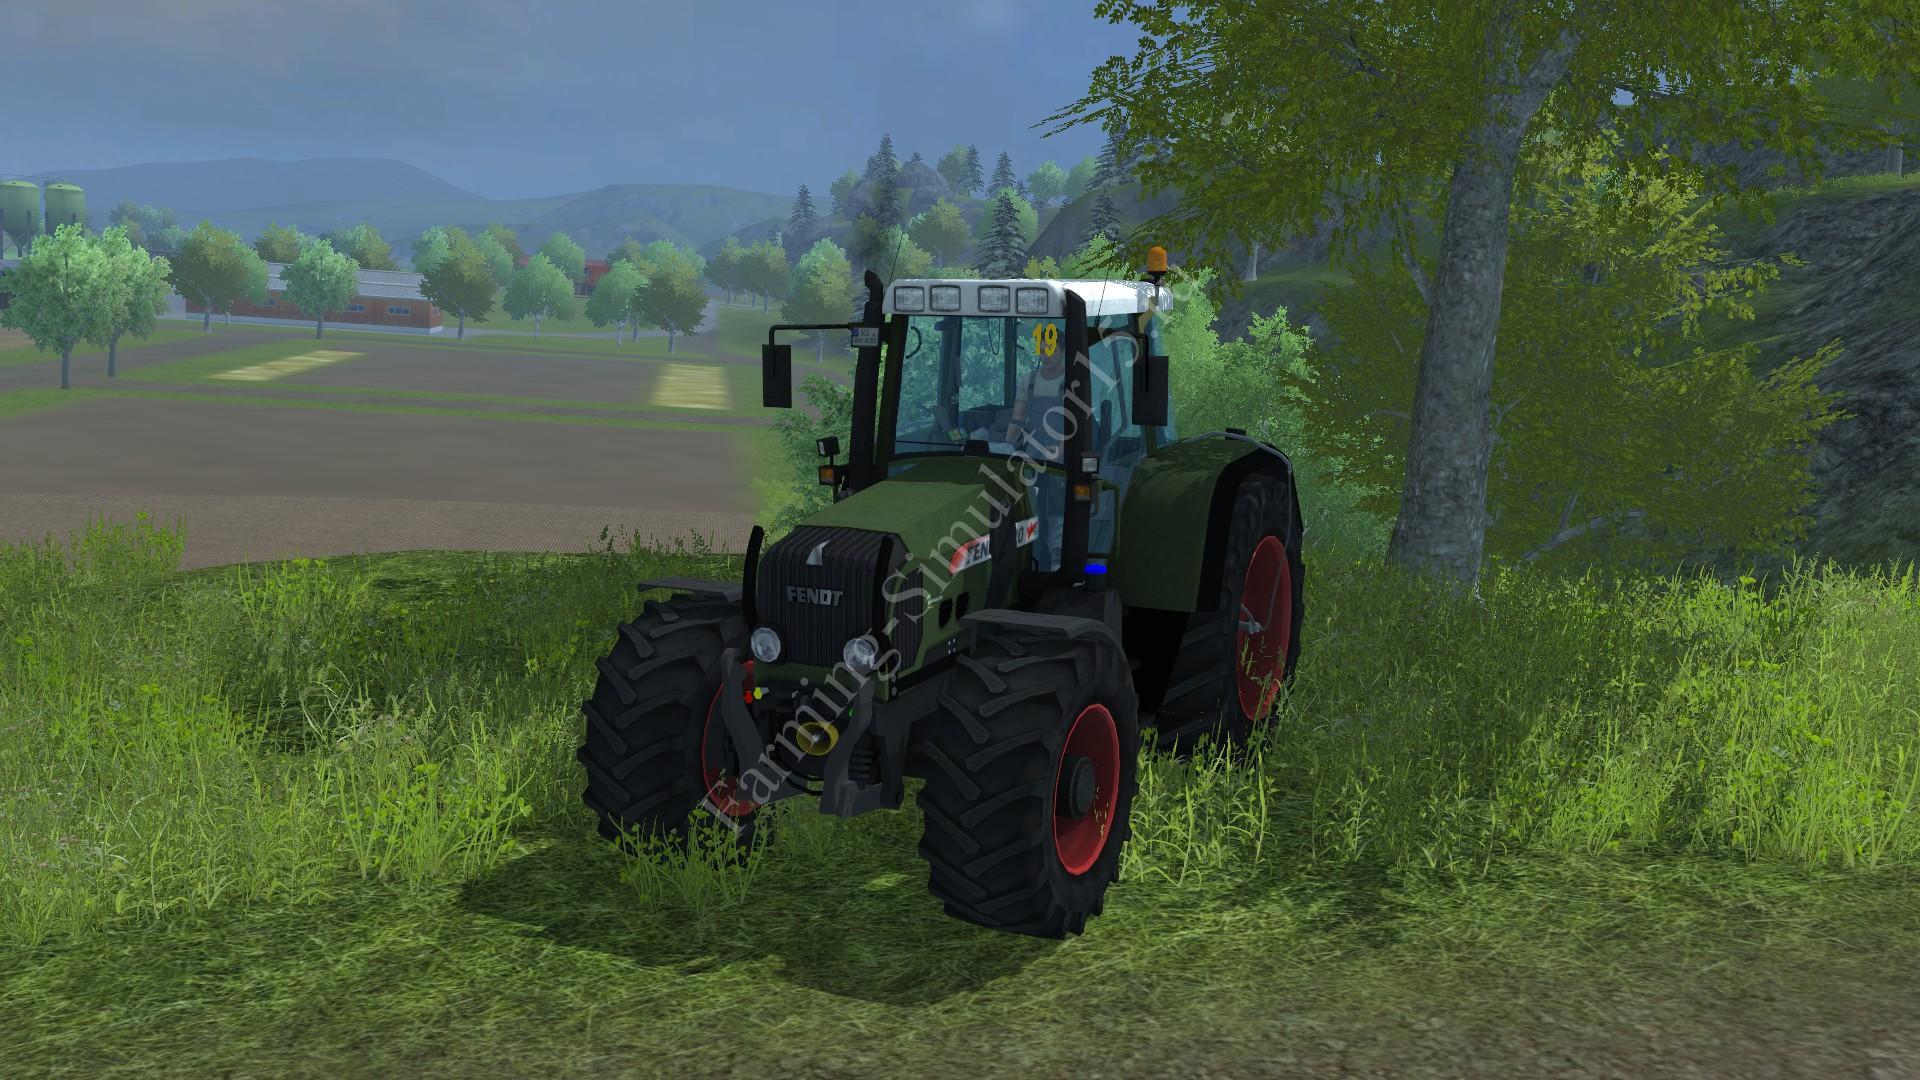 Мод трактора Fendt 820 Vario v 1.2 Farming Simulator 2013, Farming Simulator 13